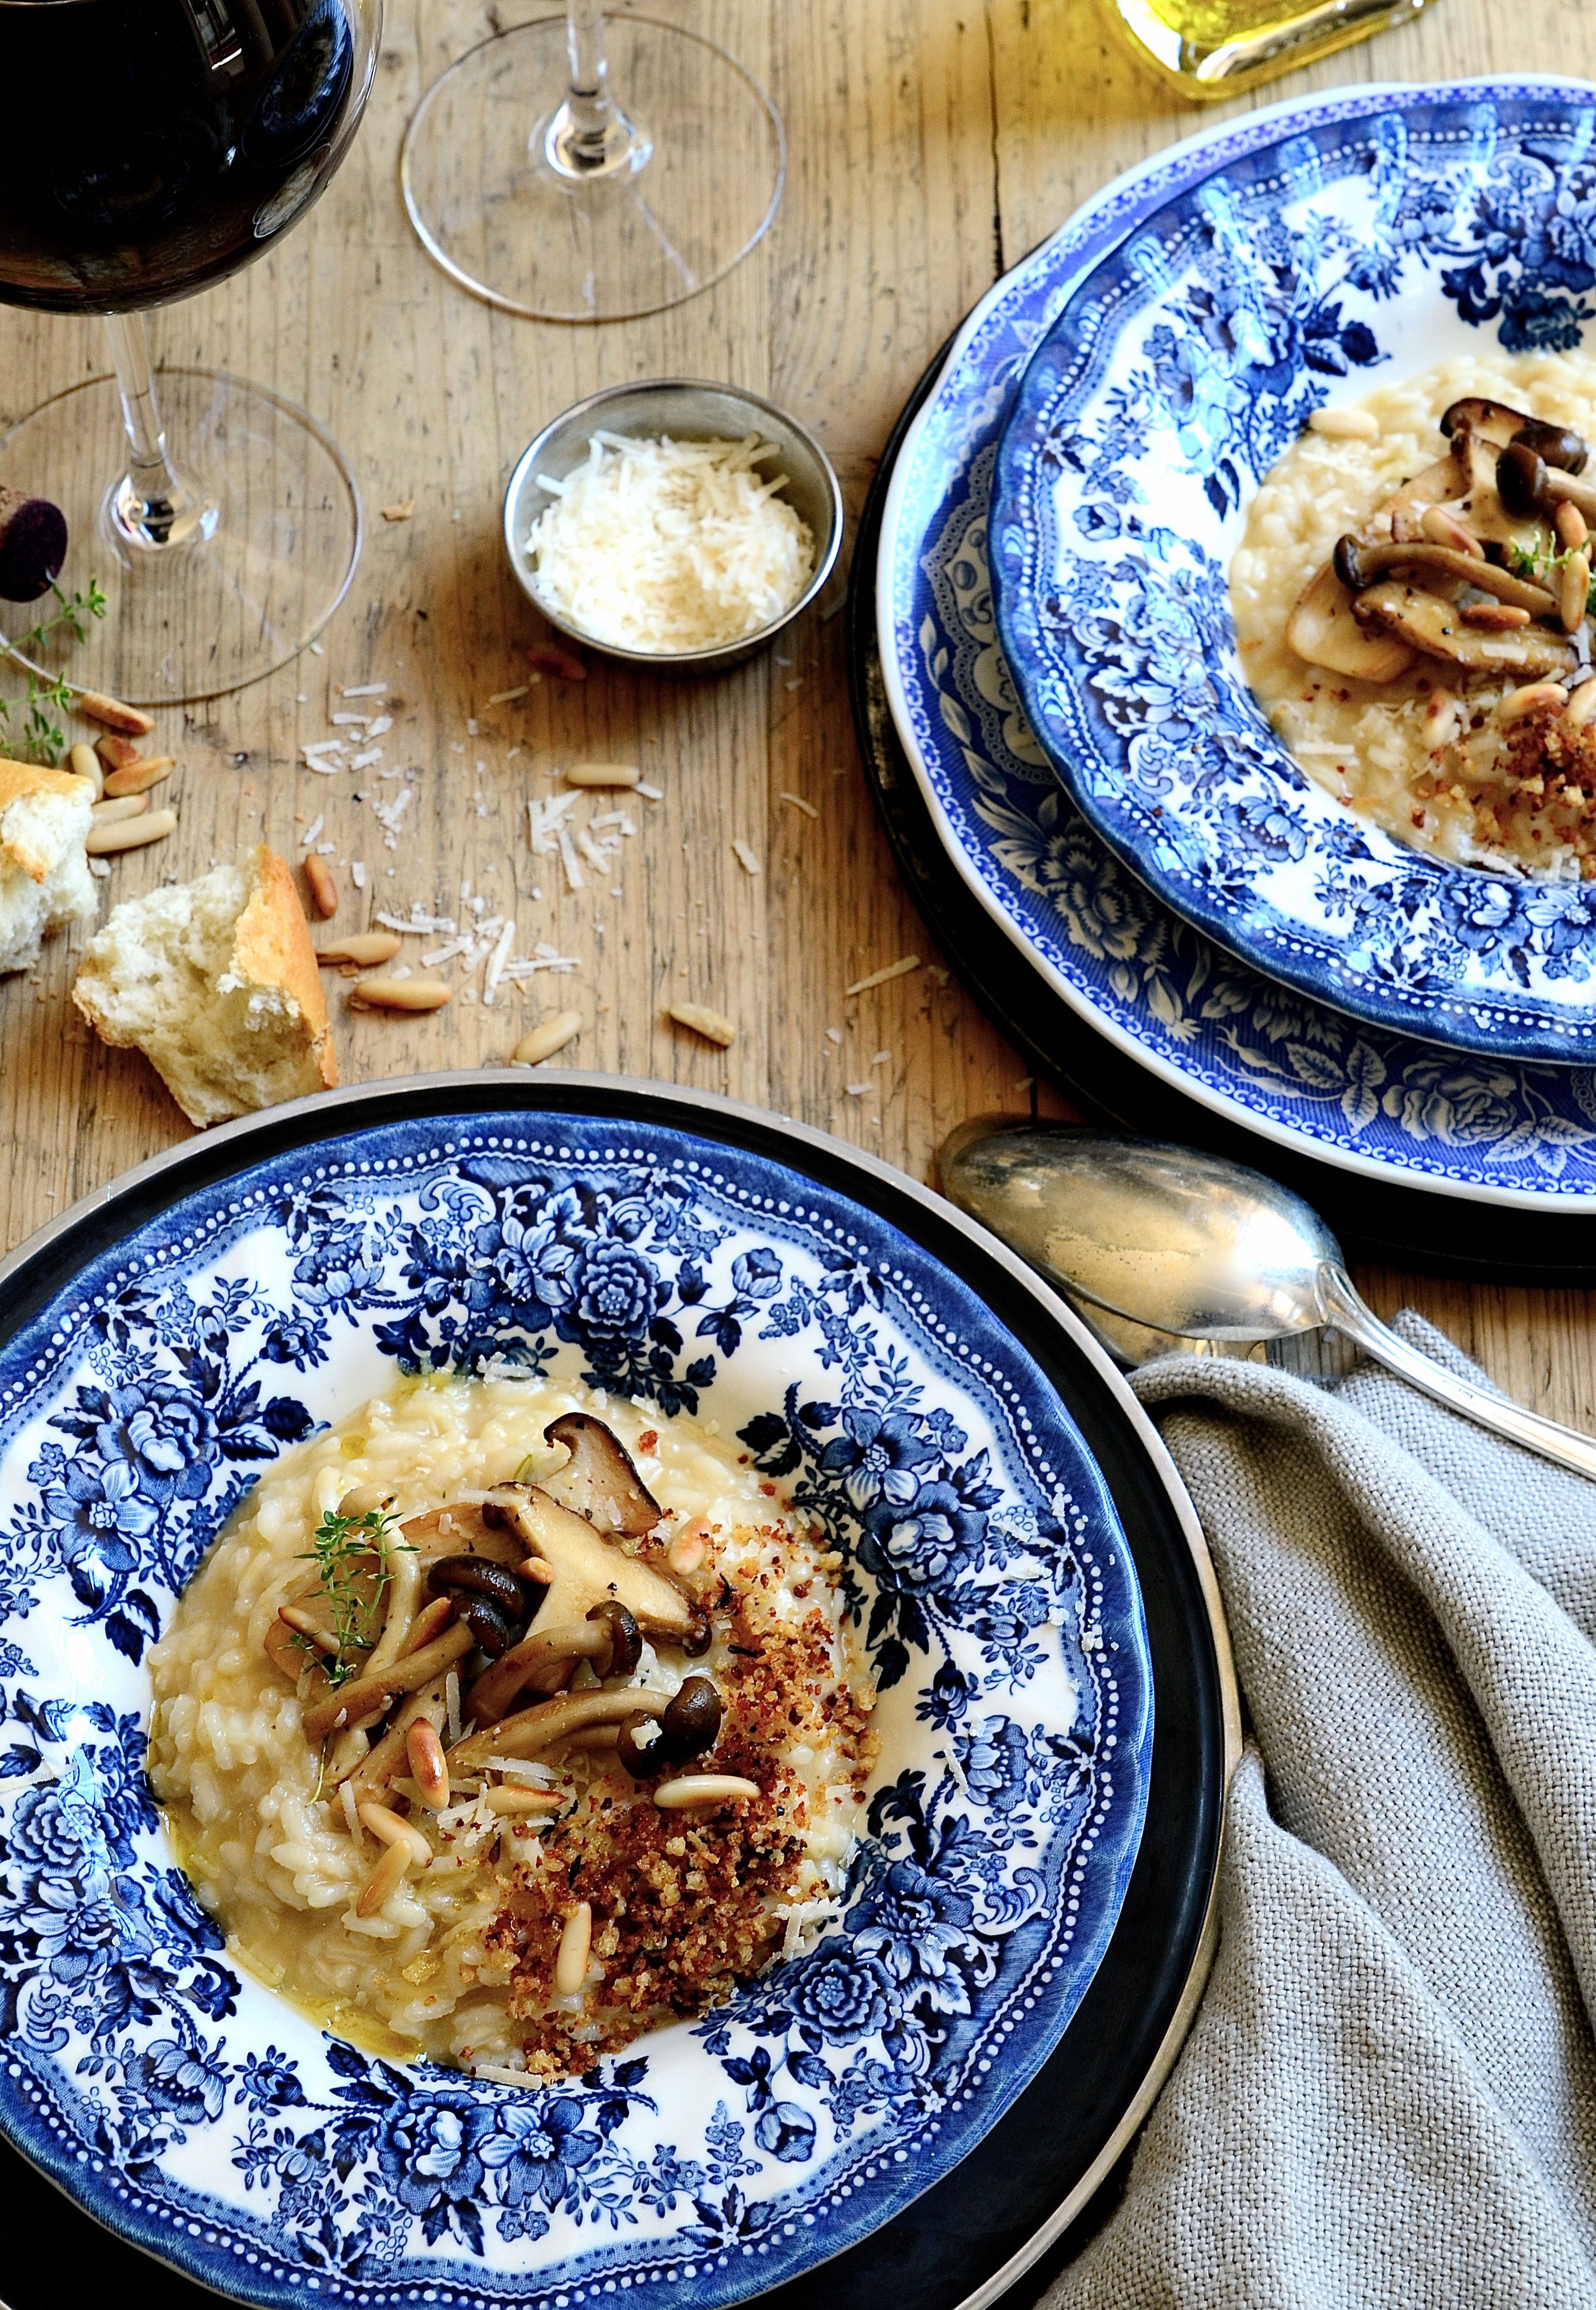 Charred leek and asparagus risotto | Bibbyskitchen at 36